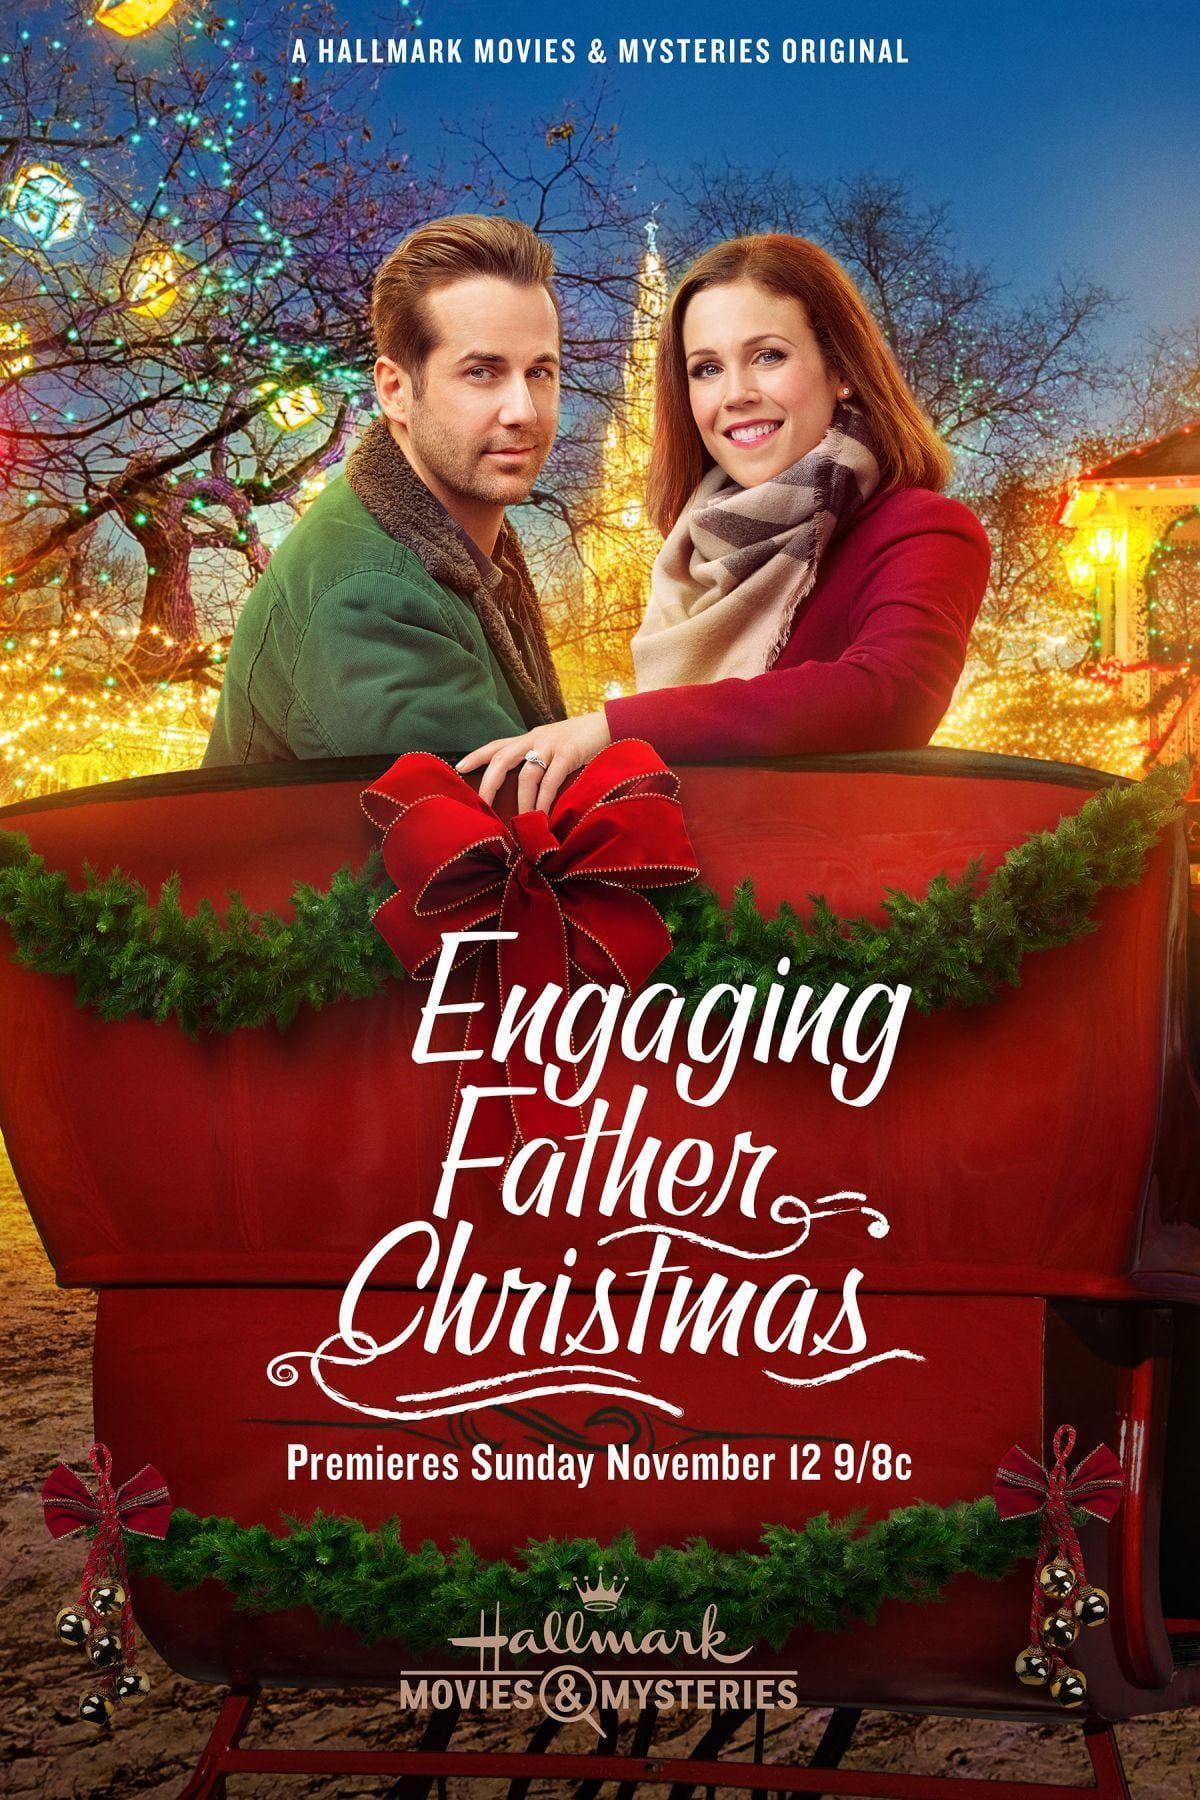 Ver Hd Online Engaging Father Christmas P E L I C U L A Completa Español Latino Hd 1080p Ultrapel Family Christmas Movies Christmas Movies Hallmark Movies